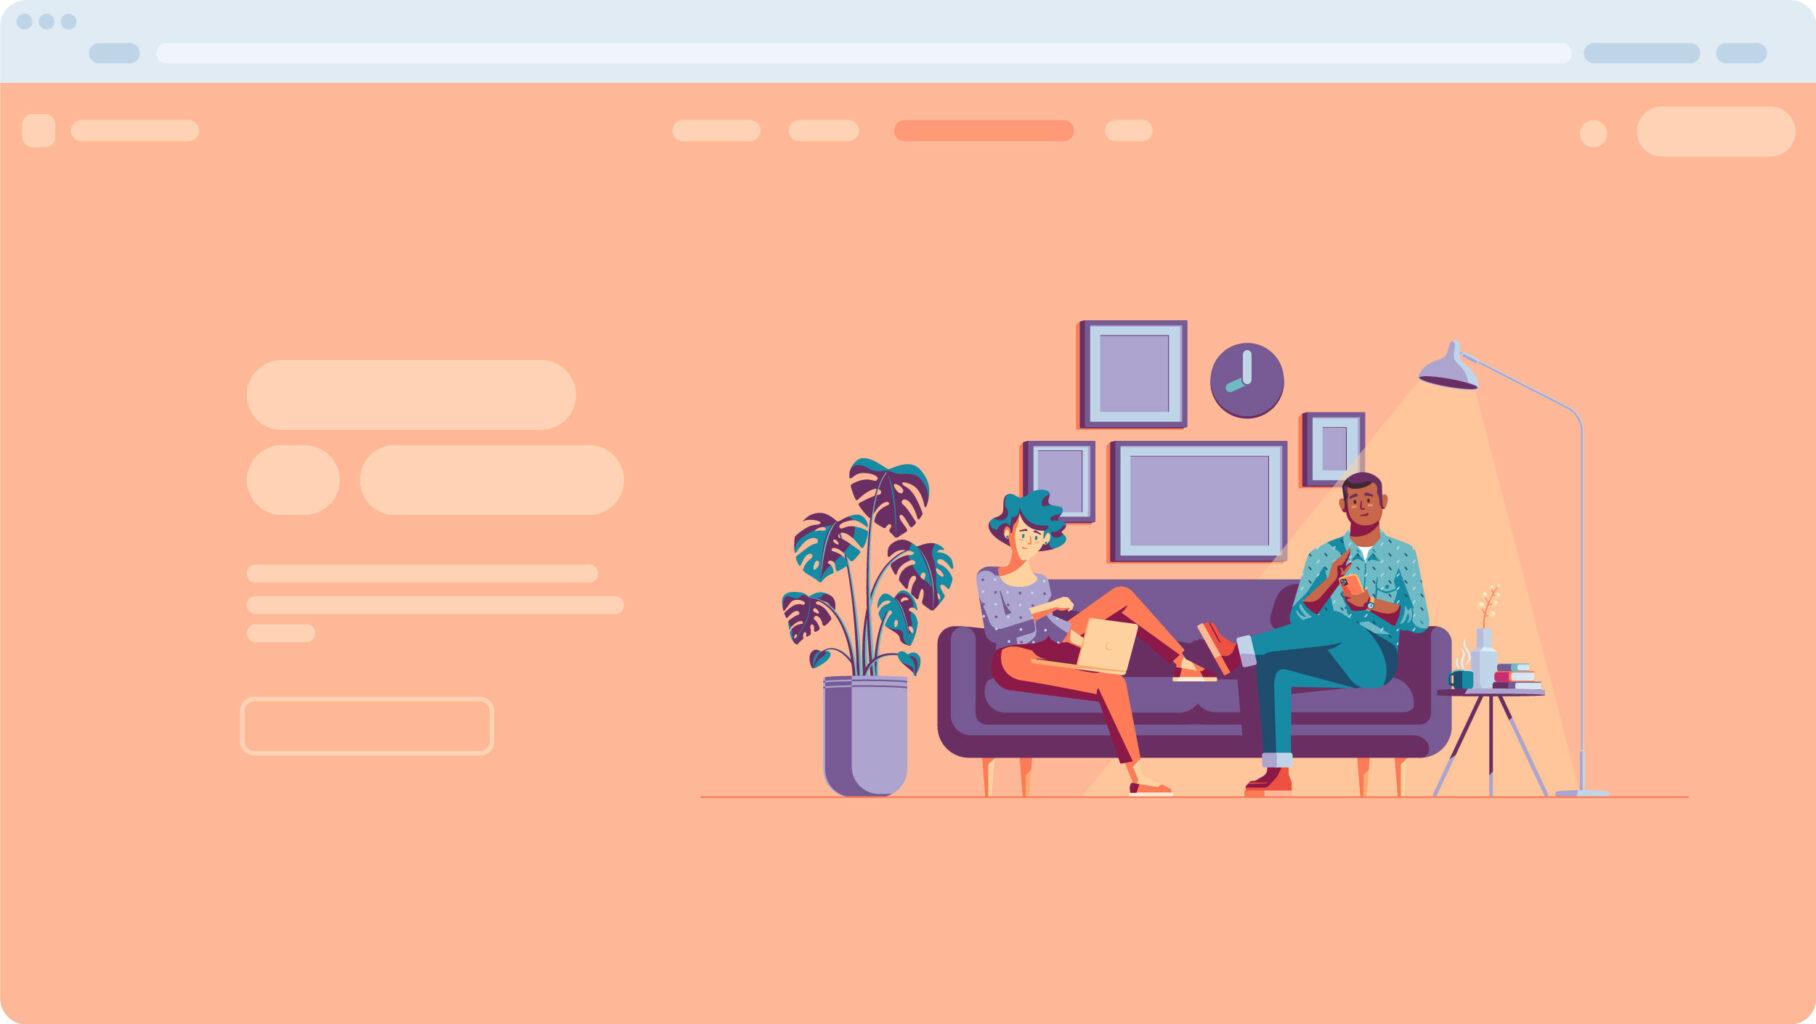 Illustration system sofa scene